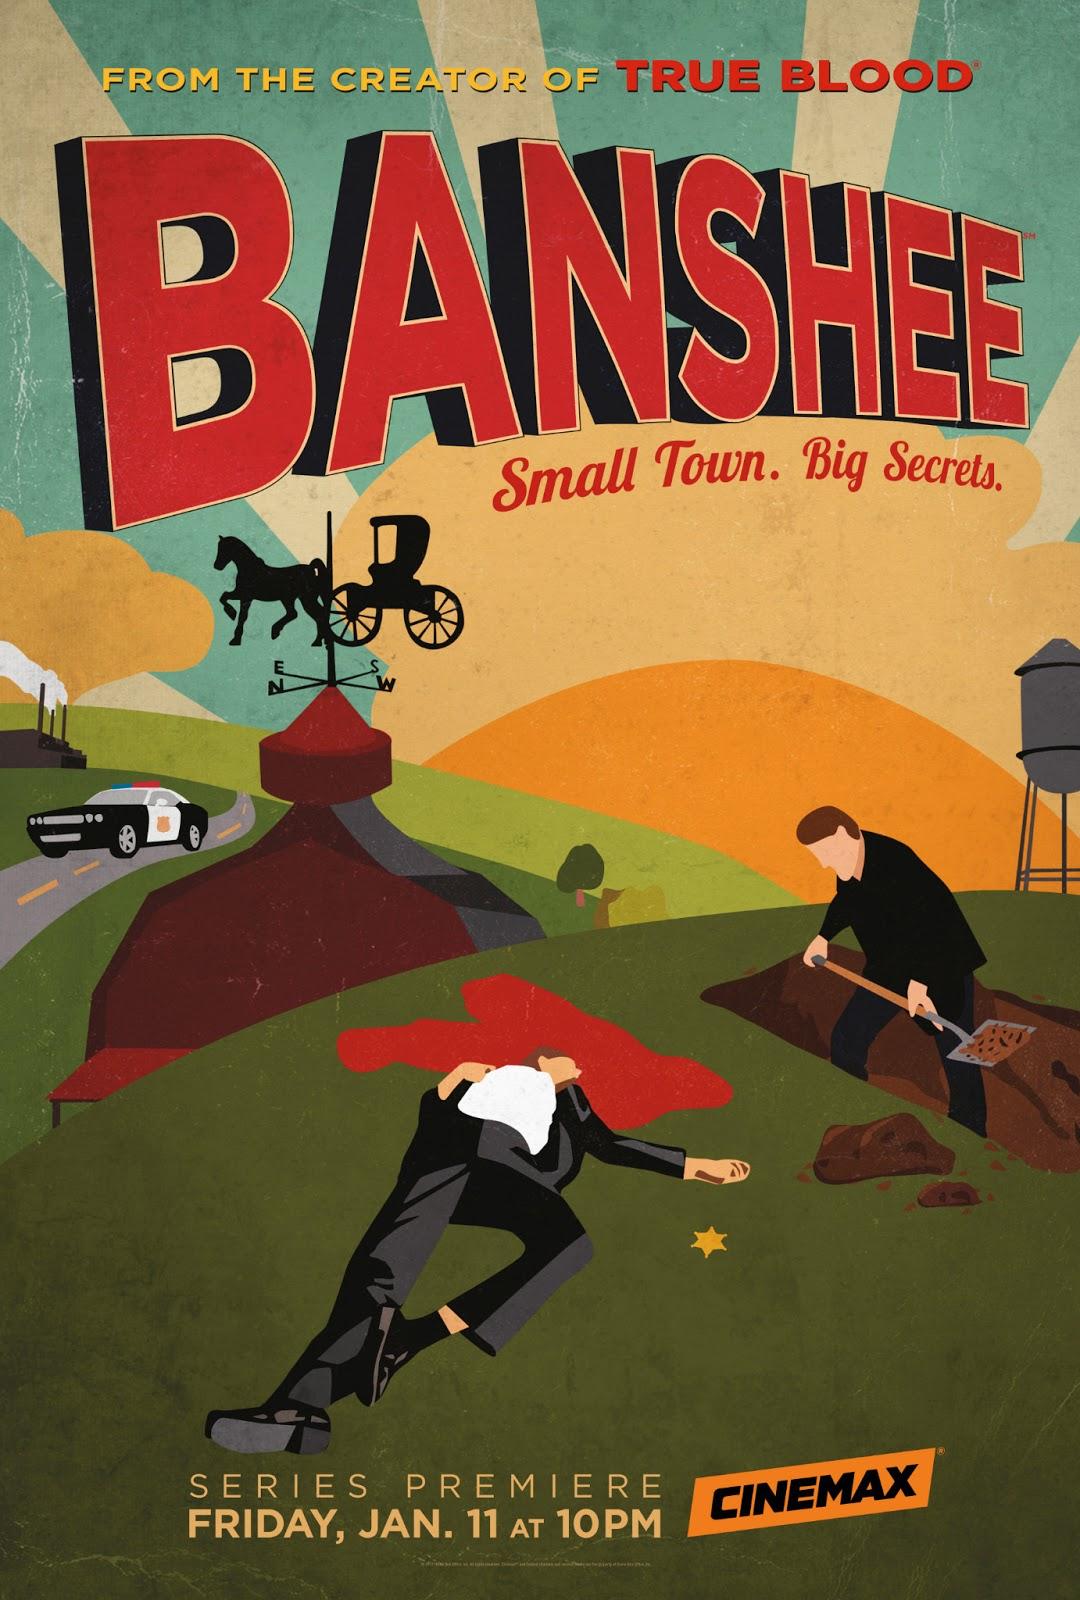 http://4.bp.blogspot.com/-06I7DzFyM9Y/UPrWGrnd9CI/AAAAAAAABz4/3R1qlJZ0Btc/s1600/Banshee-Poster.jpg